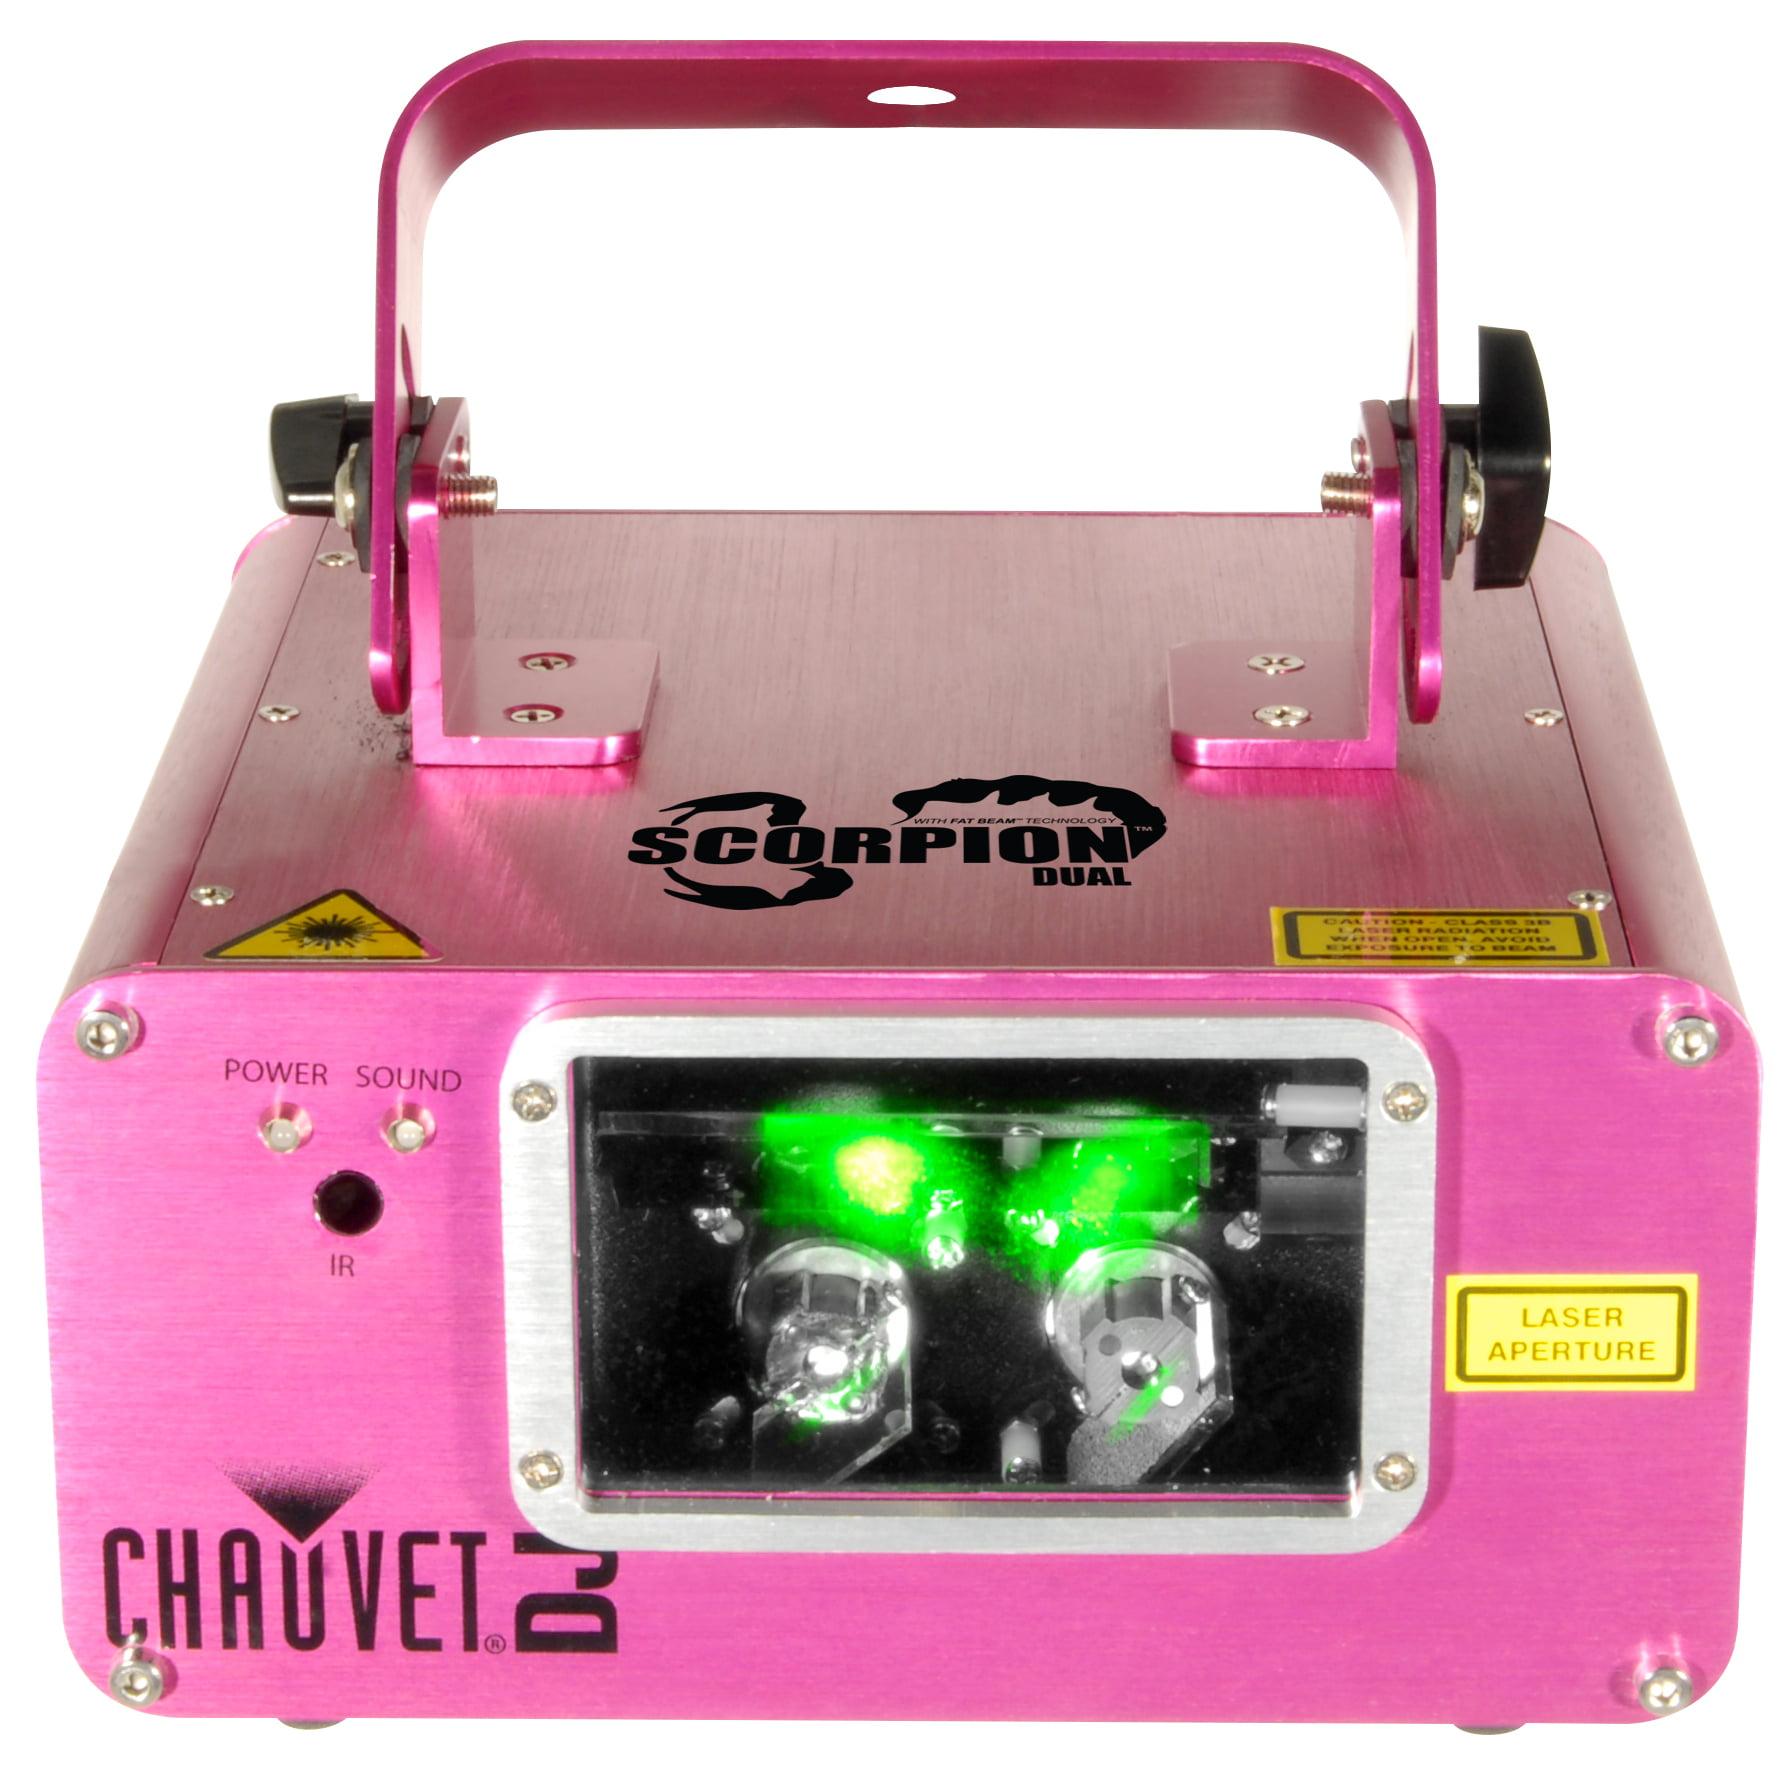 Chauvet Scorpion Dual DJ Lighting Green Laser Aerial Sky Effects Light Fixture